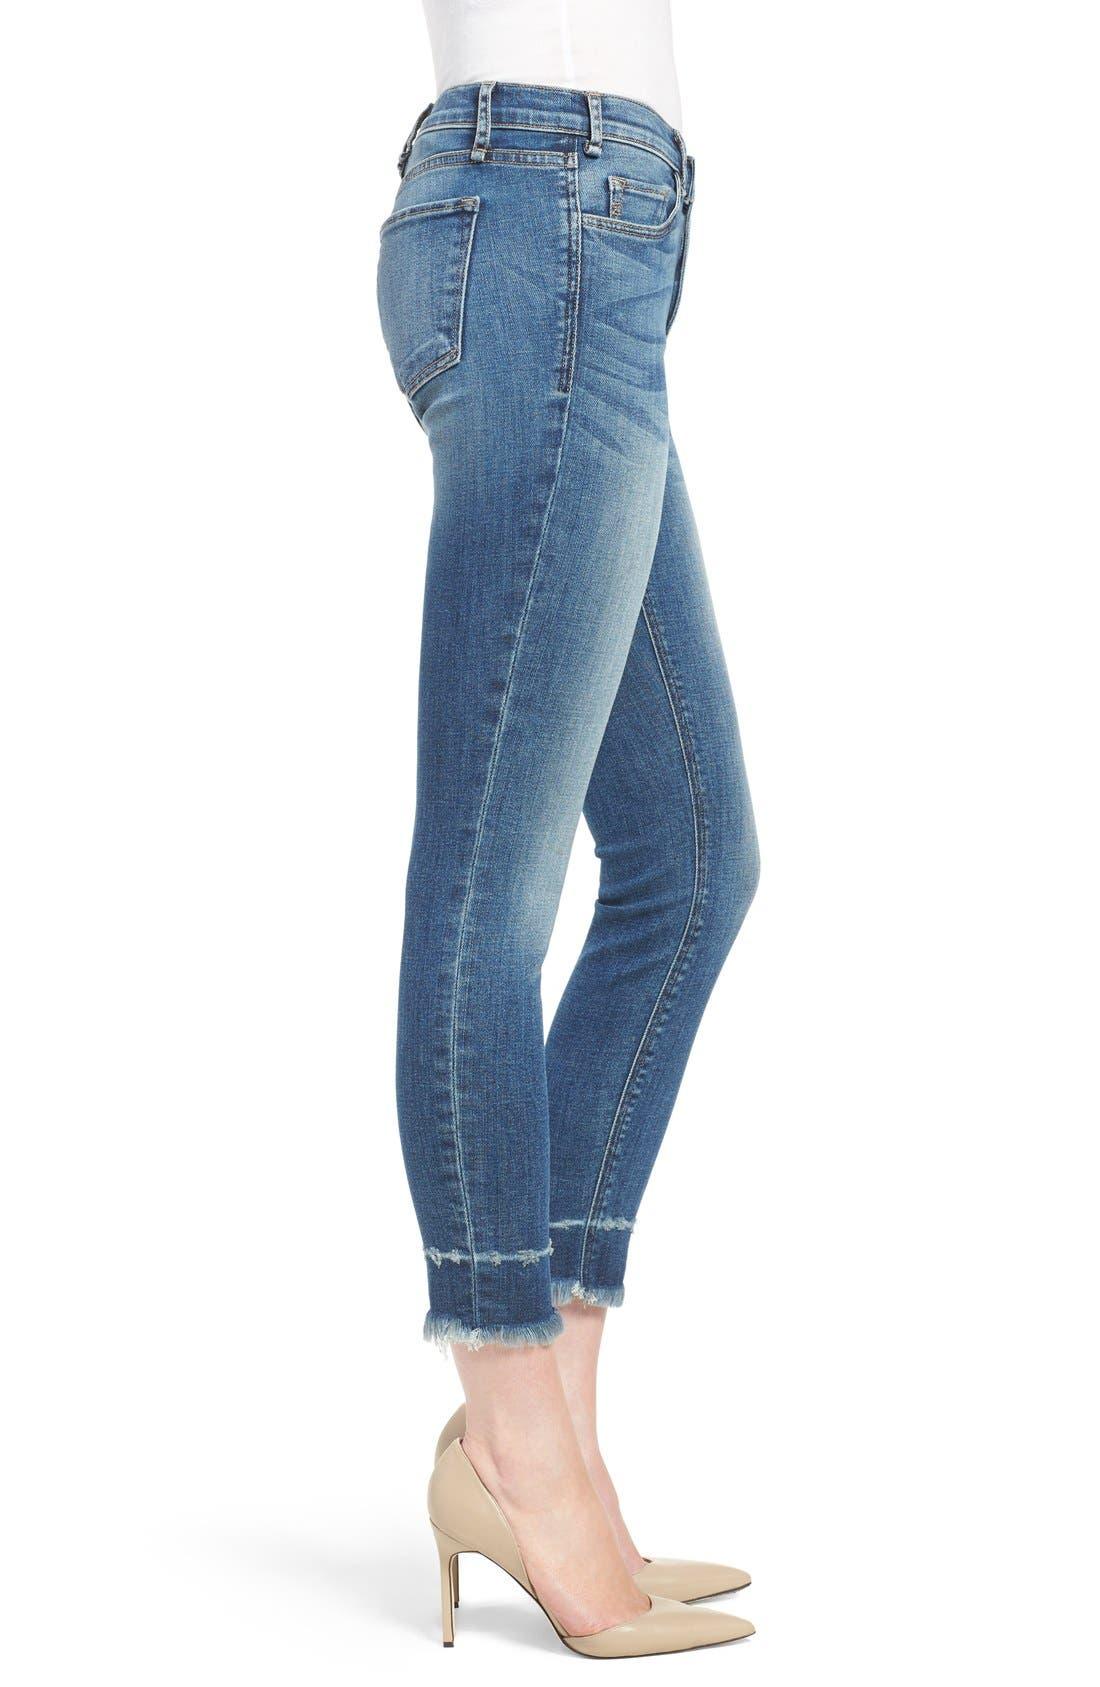 Alternate Image 3  - McGuire 'Newton' Released Hem Crop Skinny Jeans (Iona)